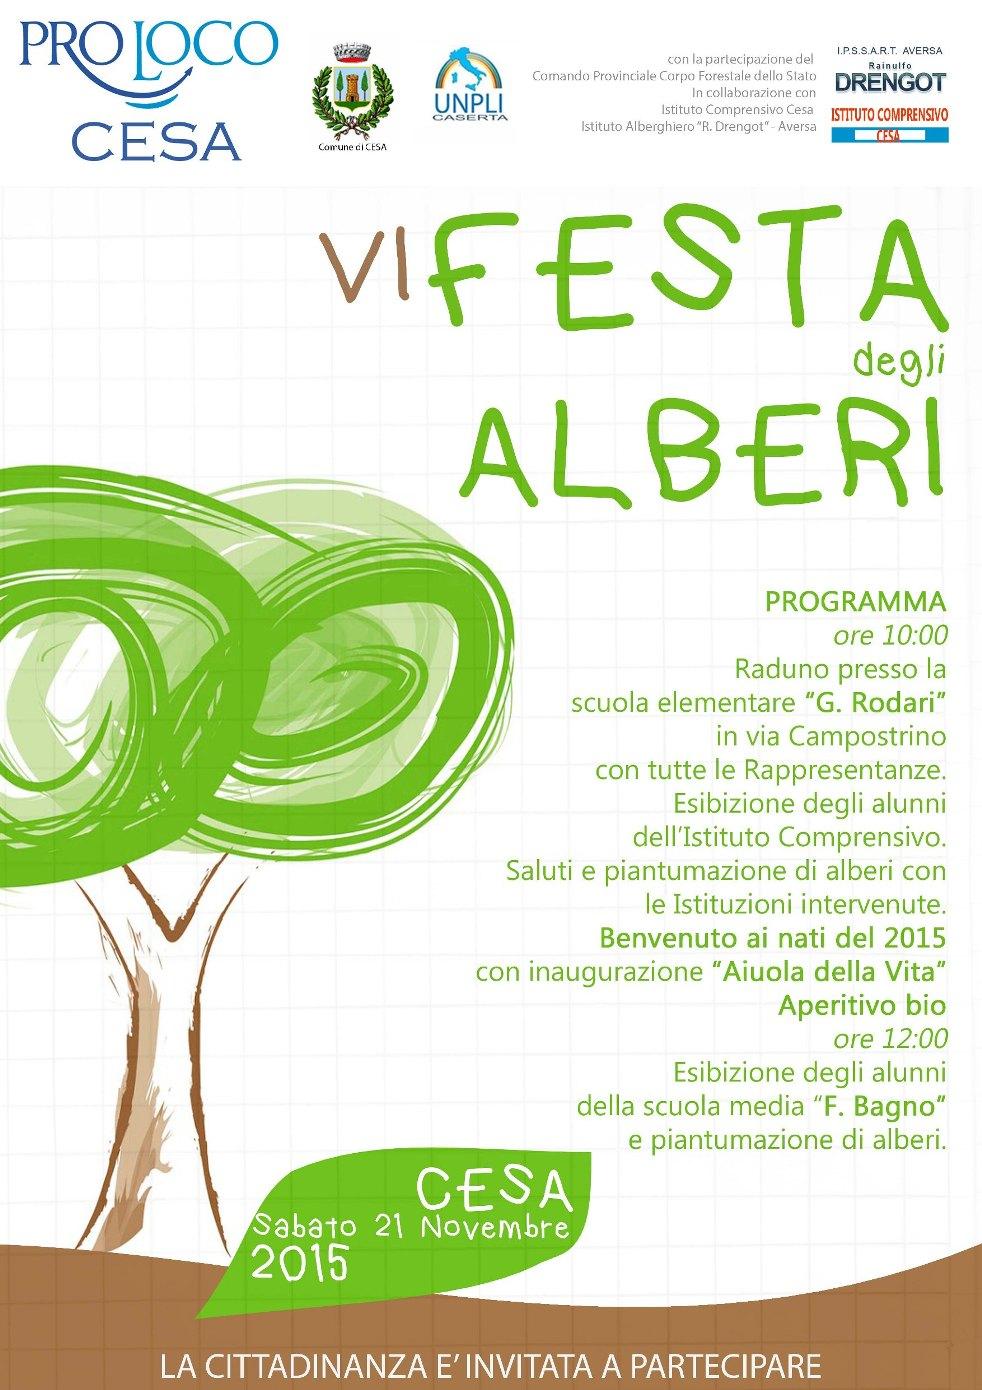 festa alberi cesa 2015